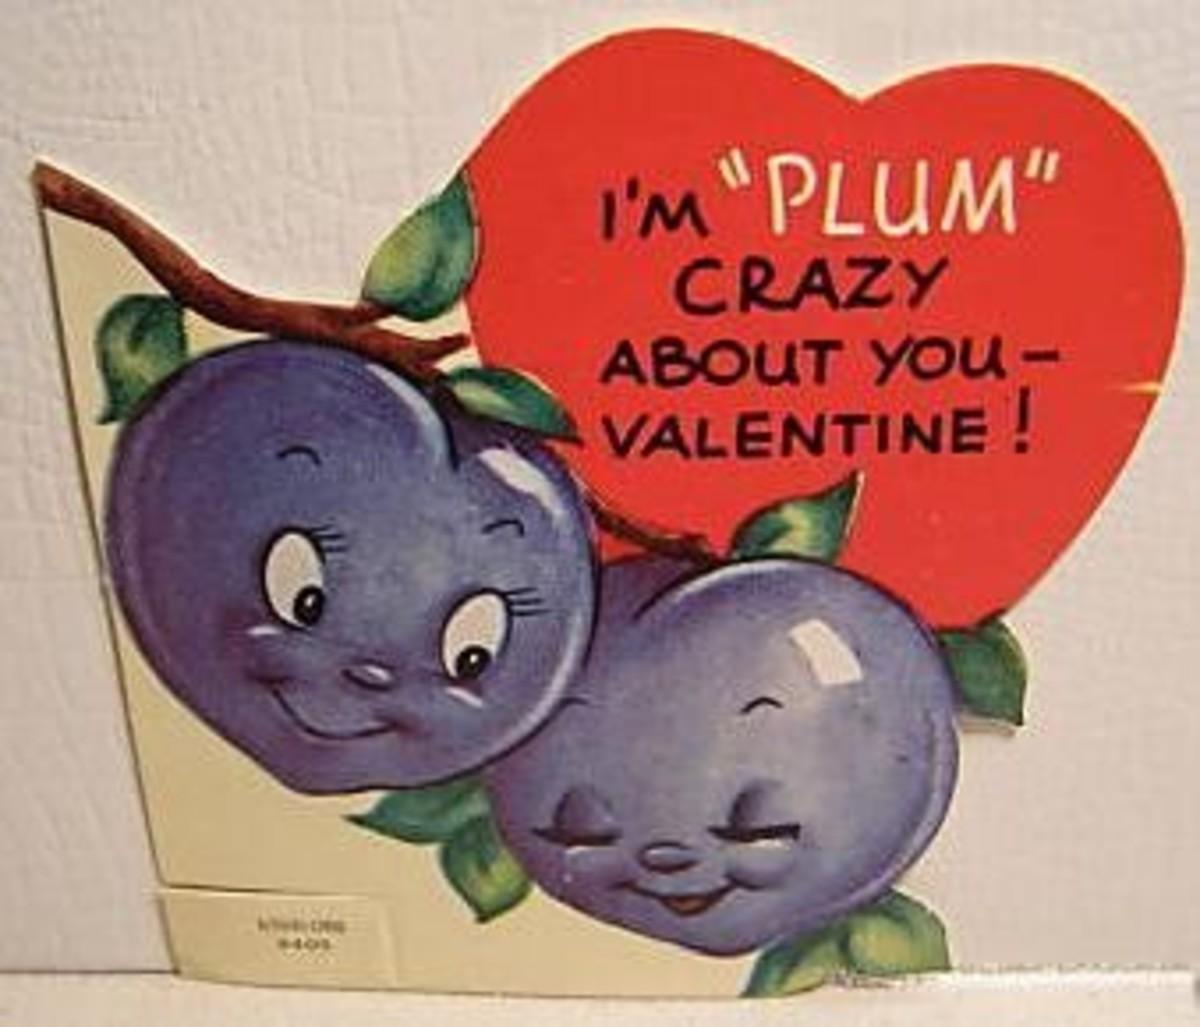 Anthropomorphic Valentine, circa 1950